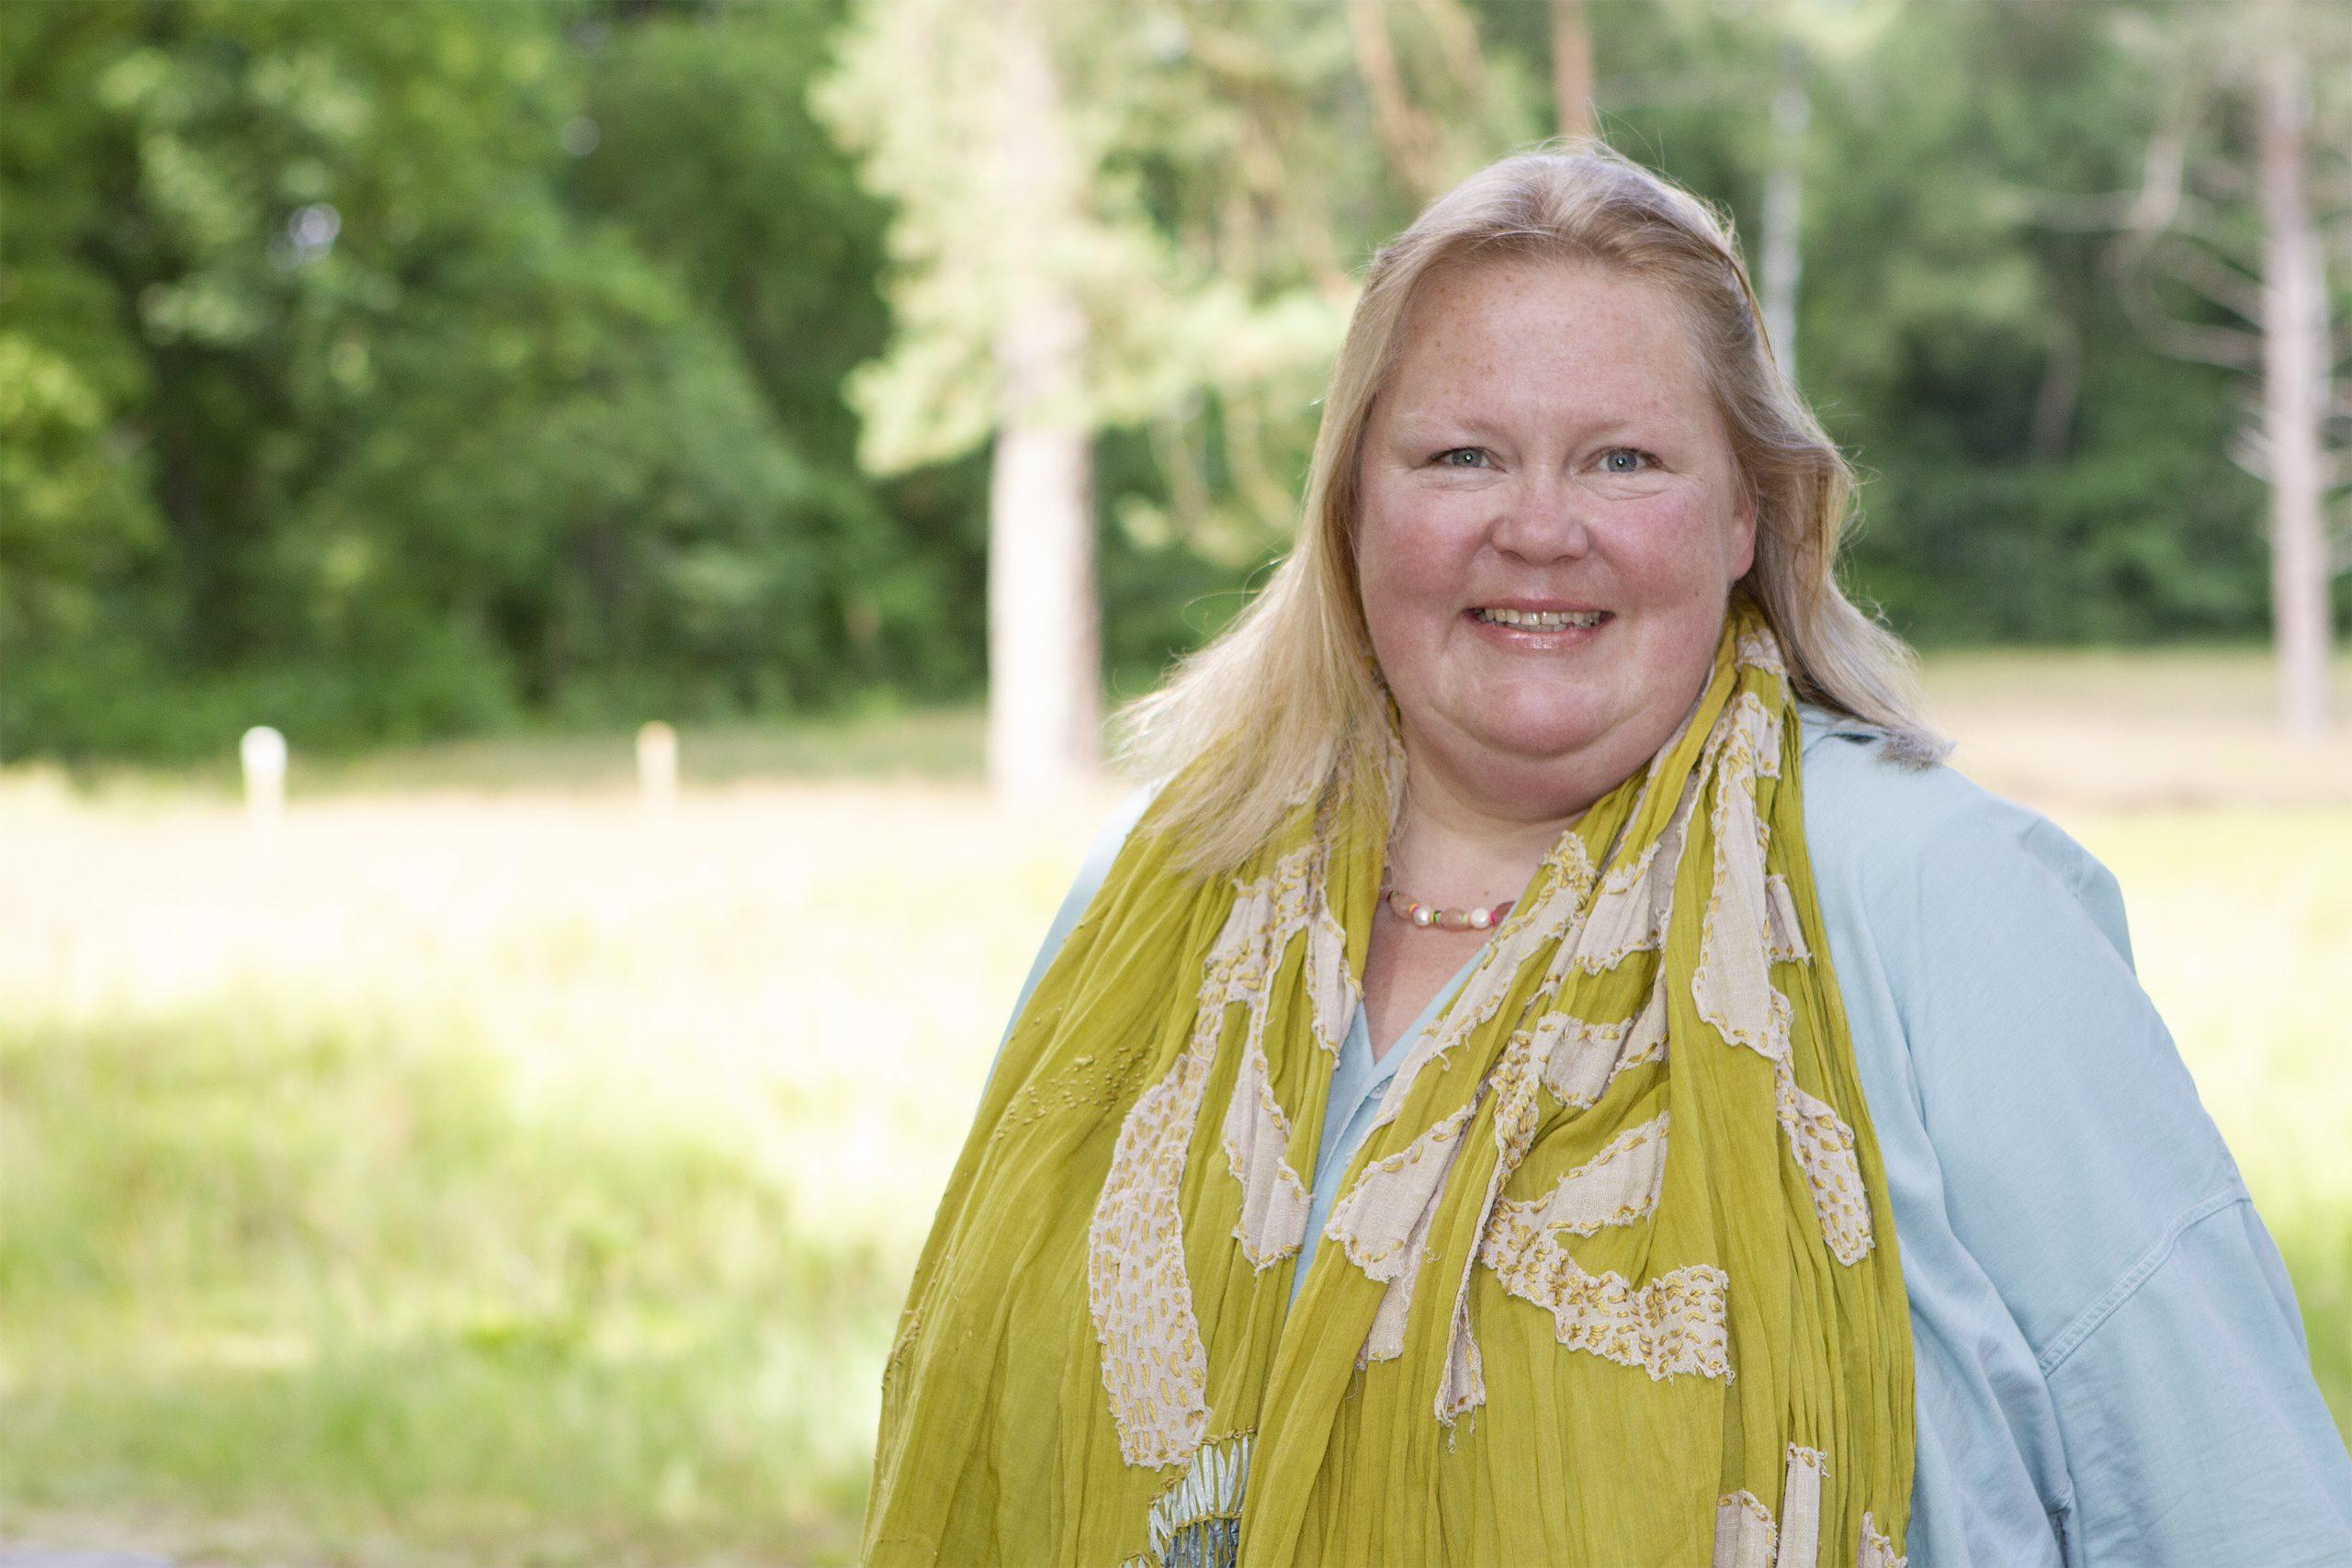 Kristina Teege Die Grünen Worpswede